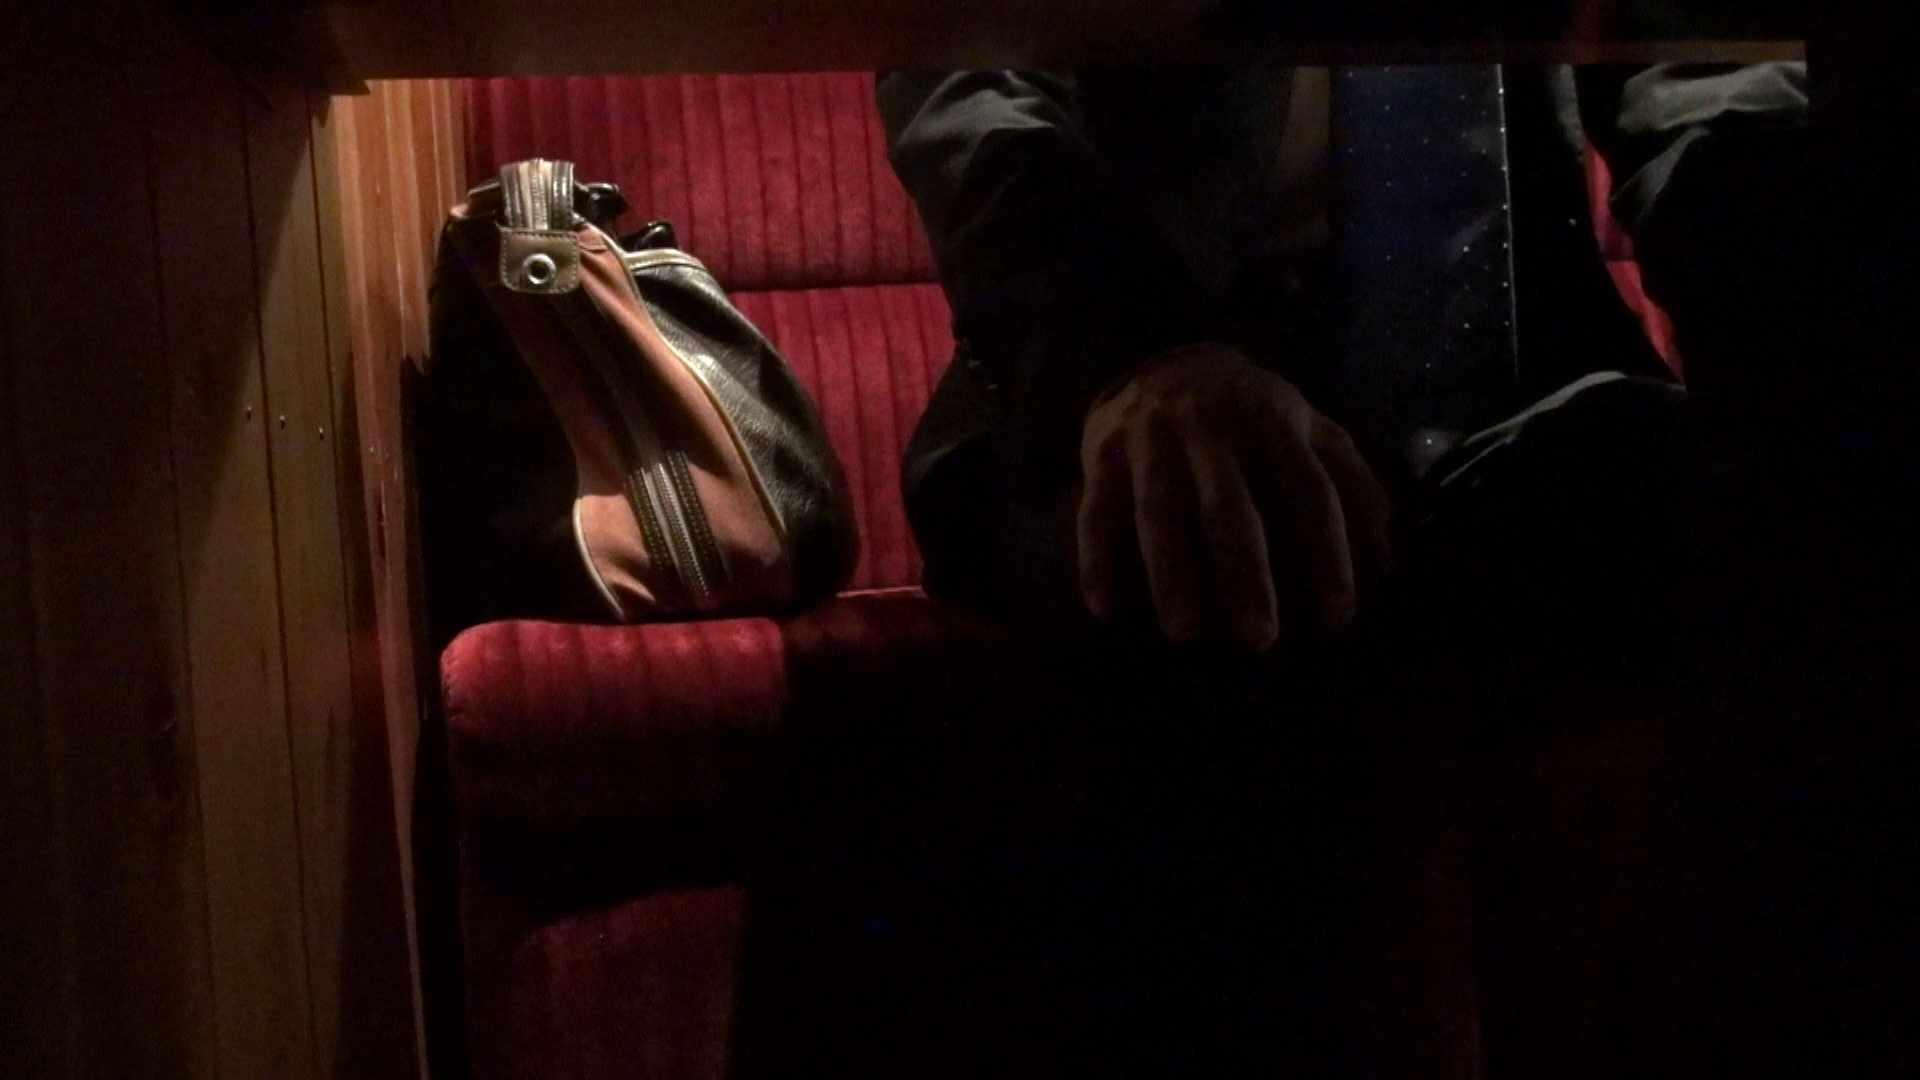 episode1 ヒロトさんと保険外交員との顔合わせ おまんこ無修正 オメコ動画キャプチャ 71pic 34